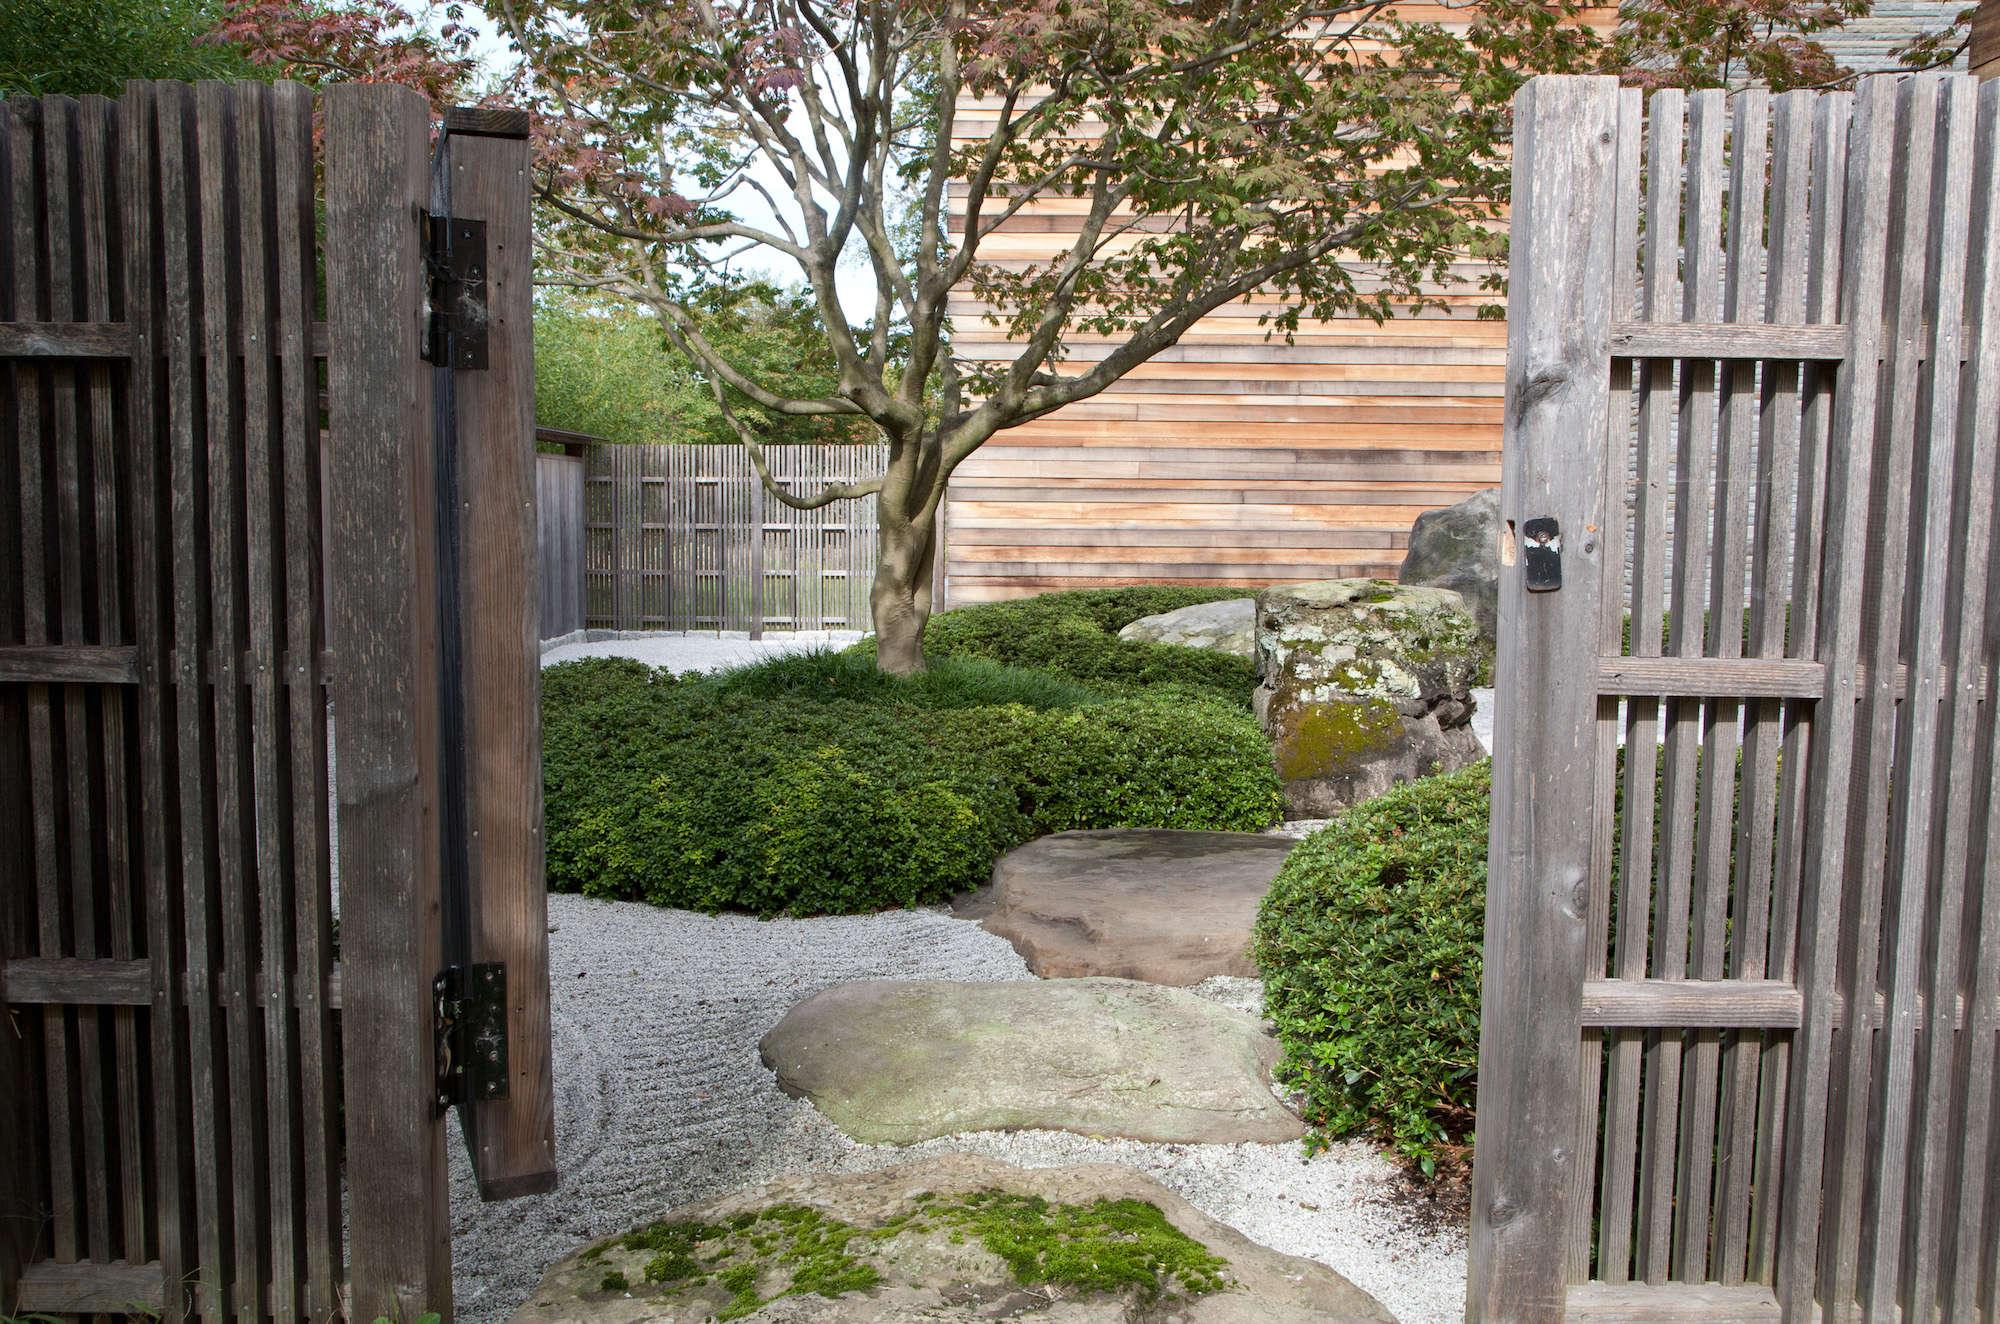 Japanese Garden Structures Designer Visit A Garden Inspired By Japan In Westchester County